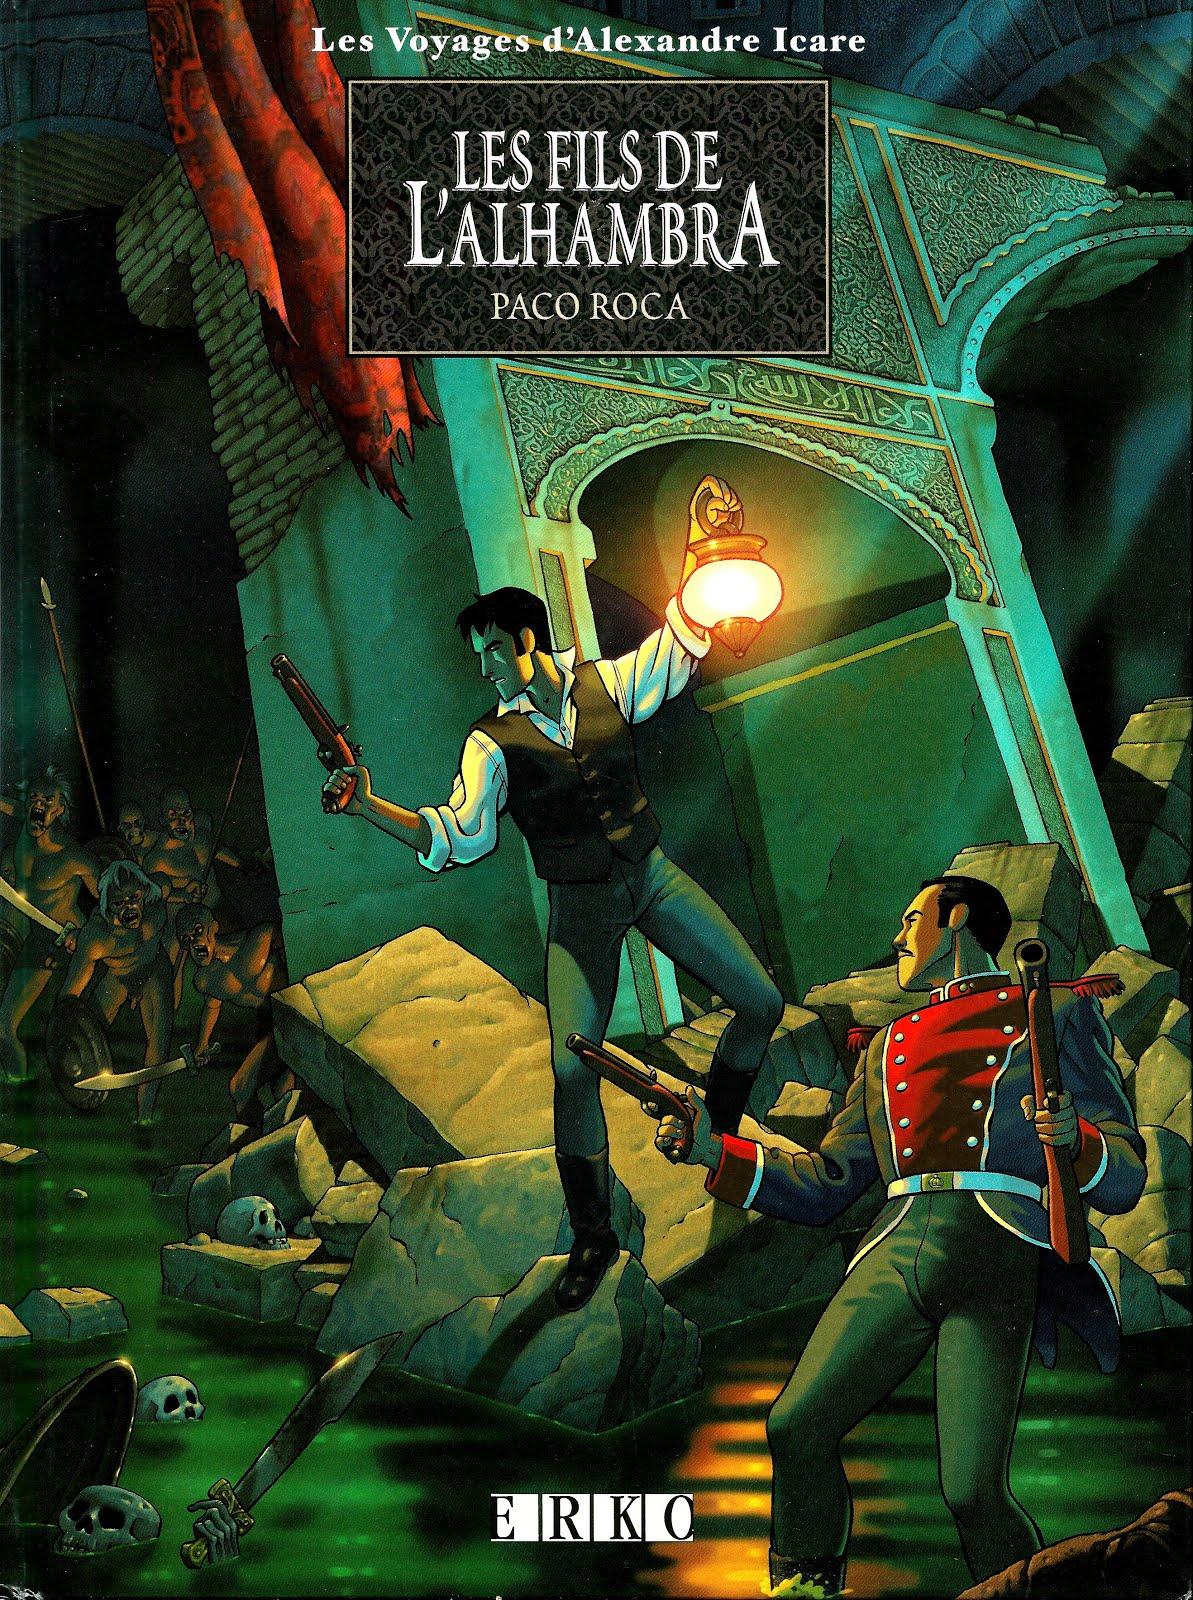 Les fils de l'Alhambra - Paco Roca. Scan: Grenade (inédit)